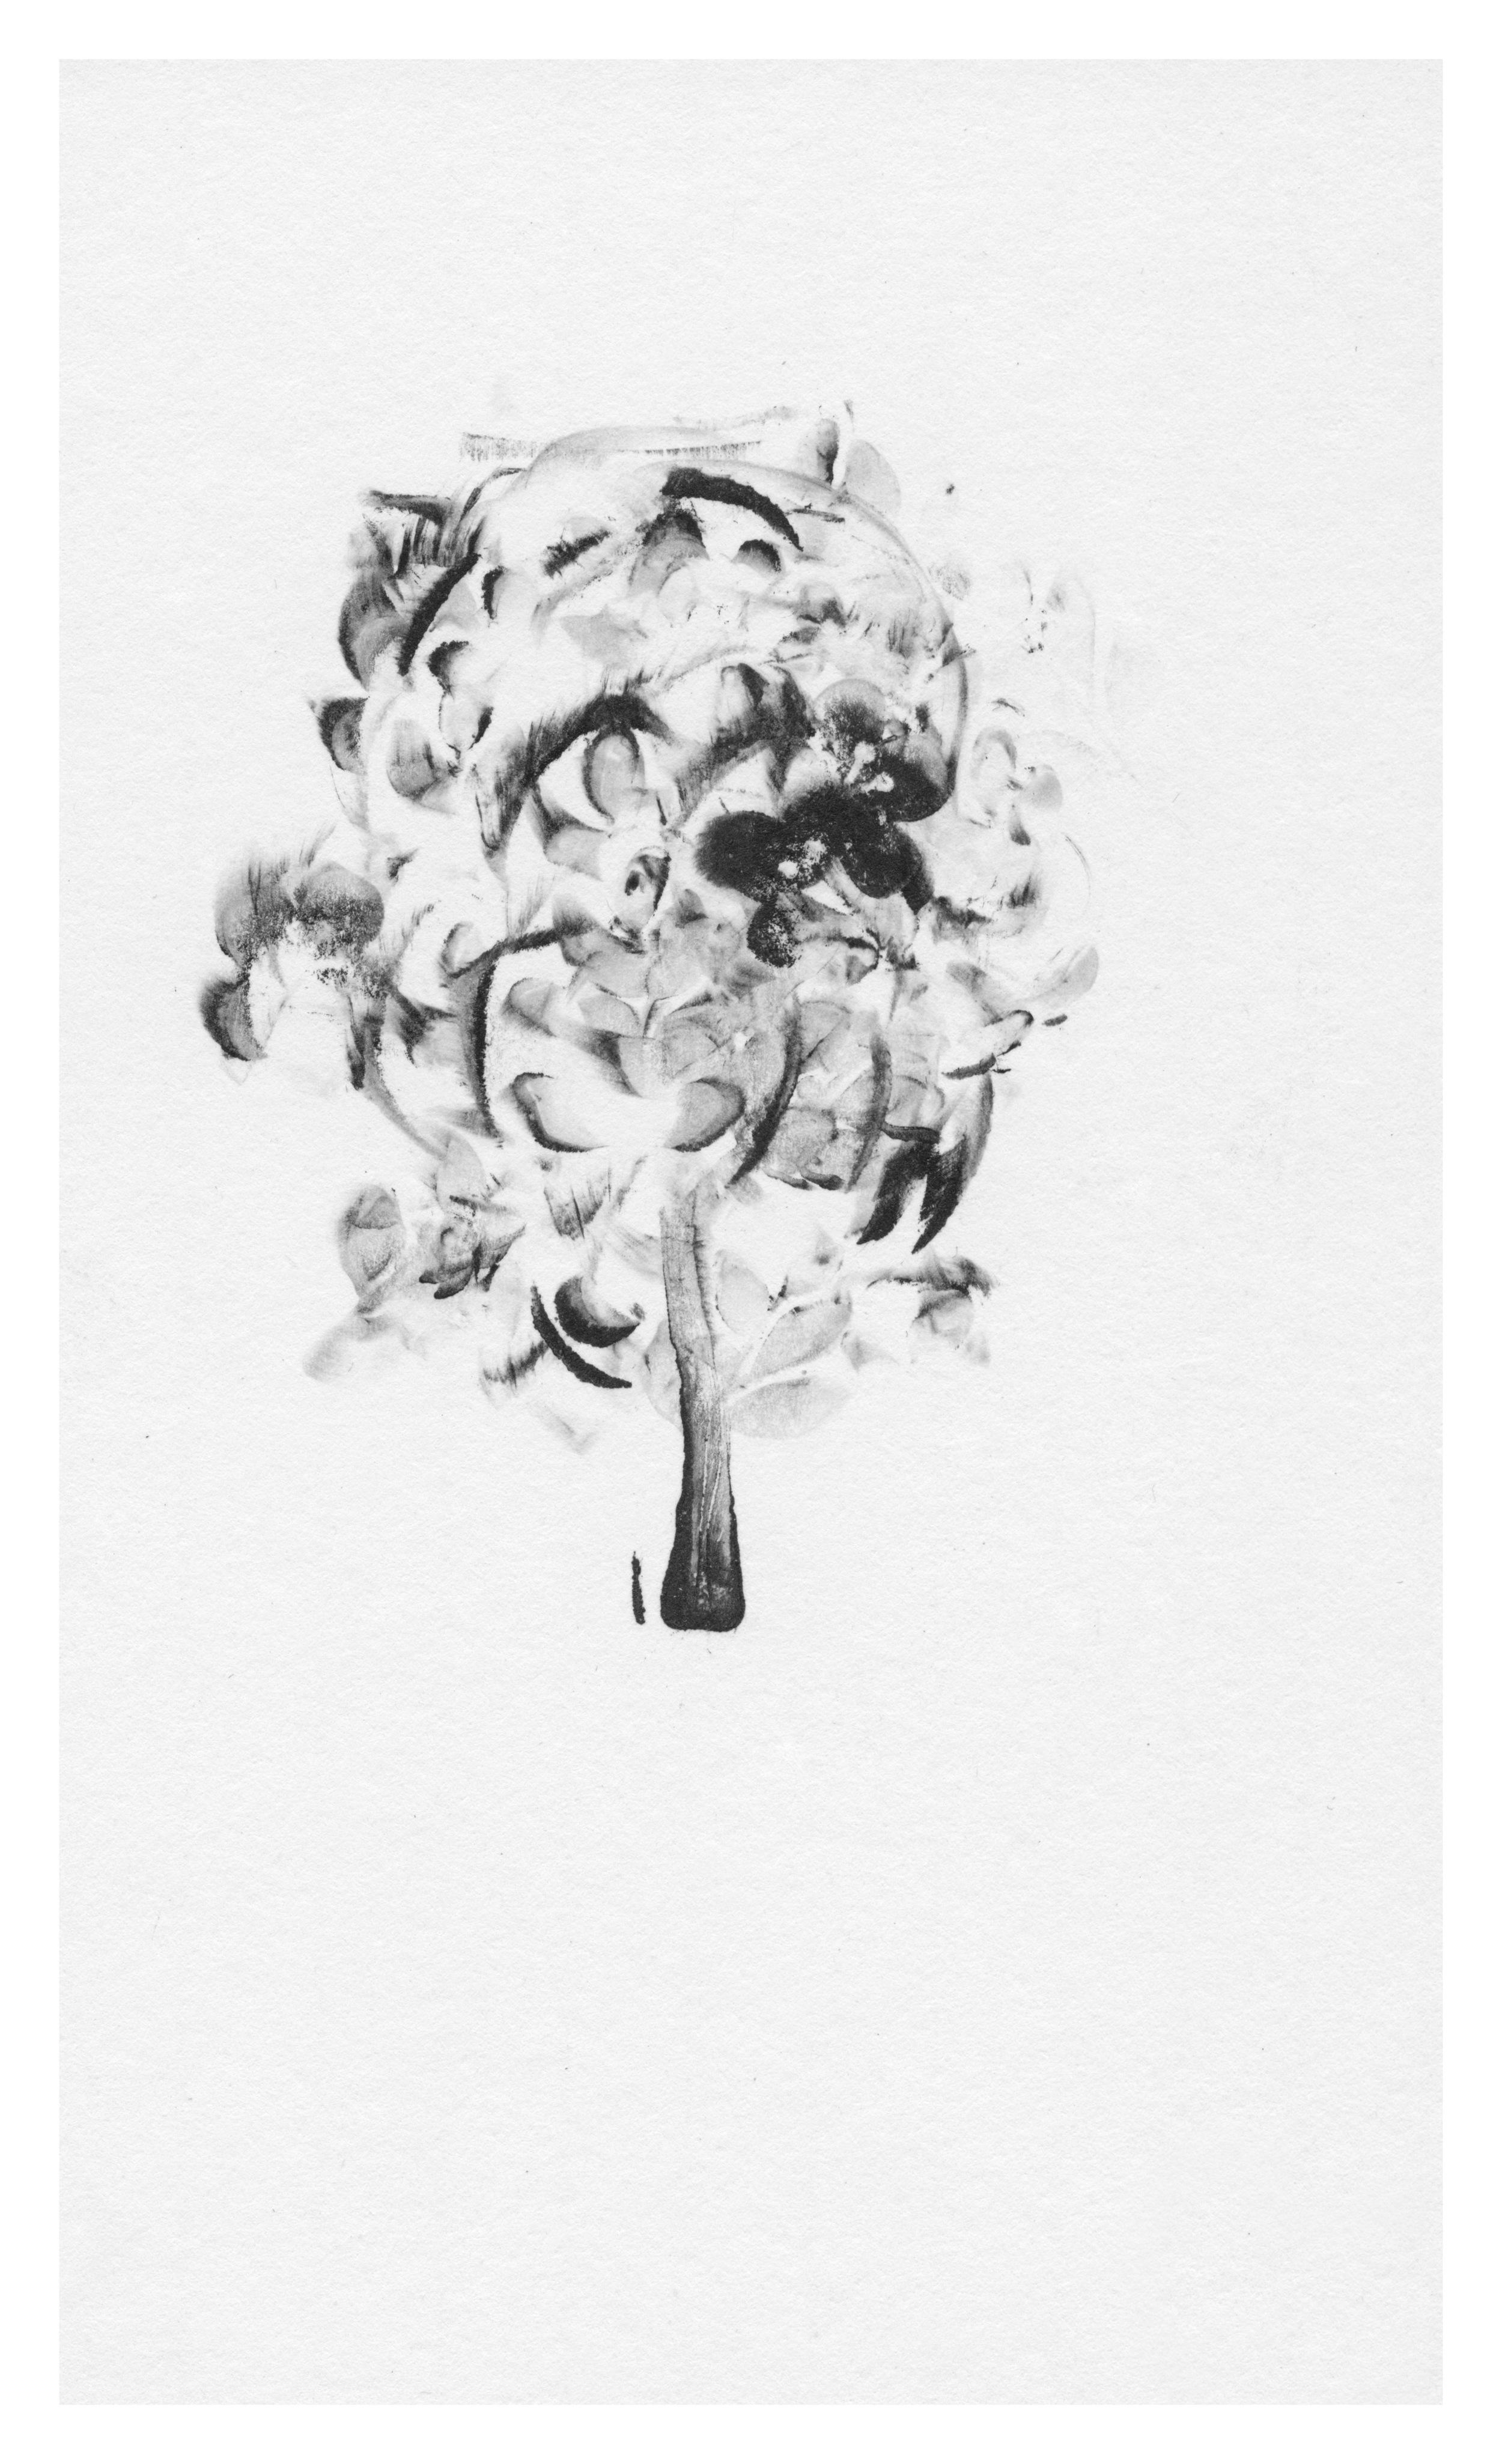 trees19.jpg